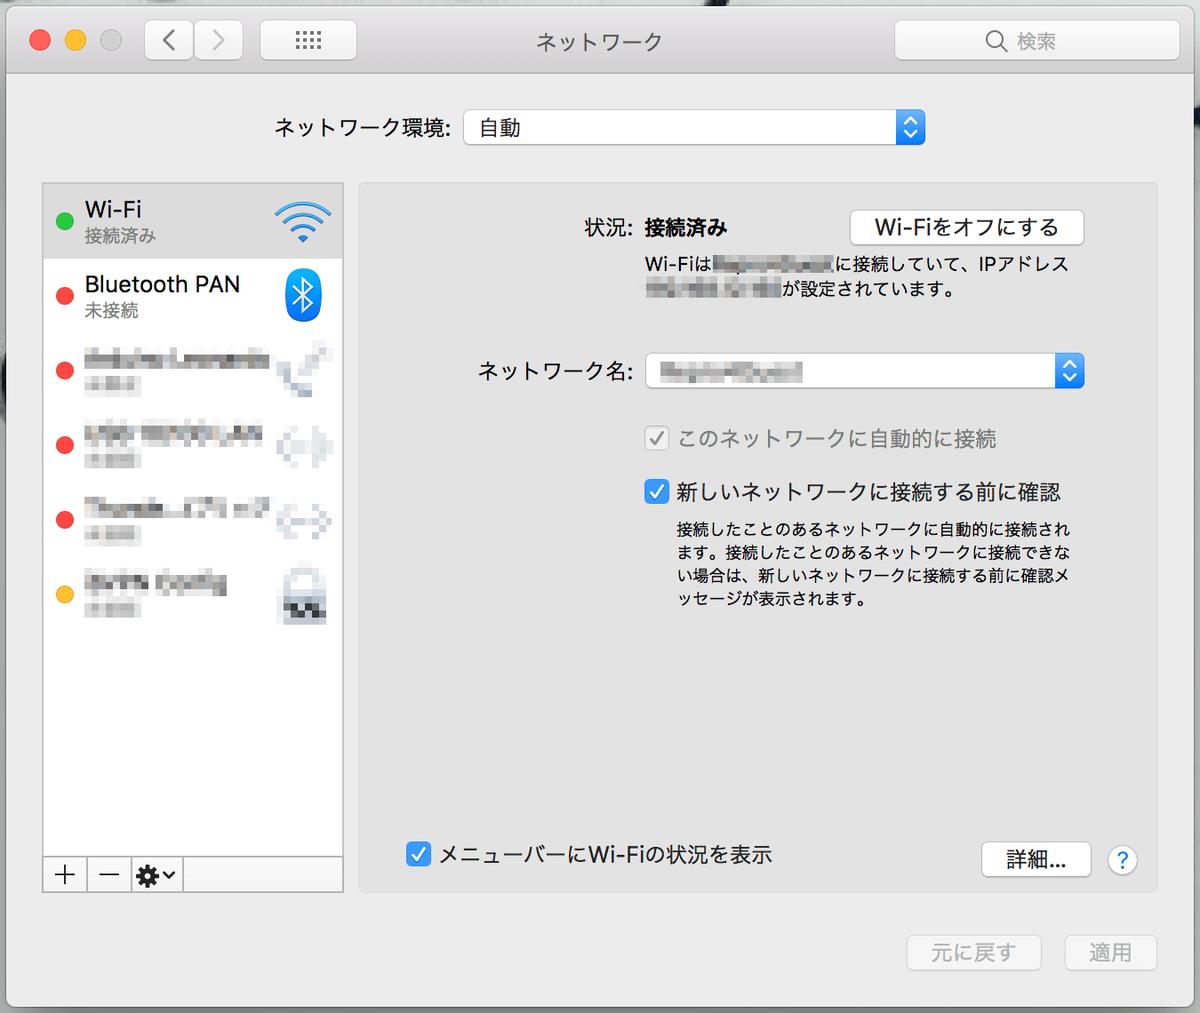 f:id:kikiki-kiki:20190803143321p:plain